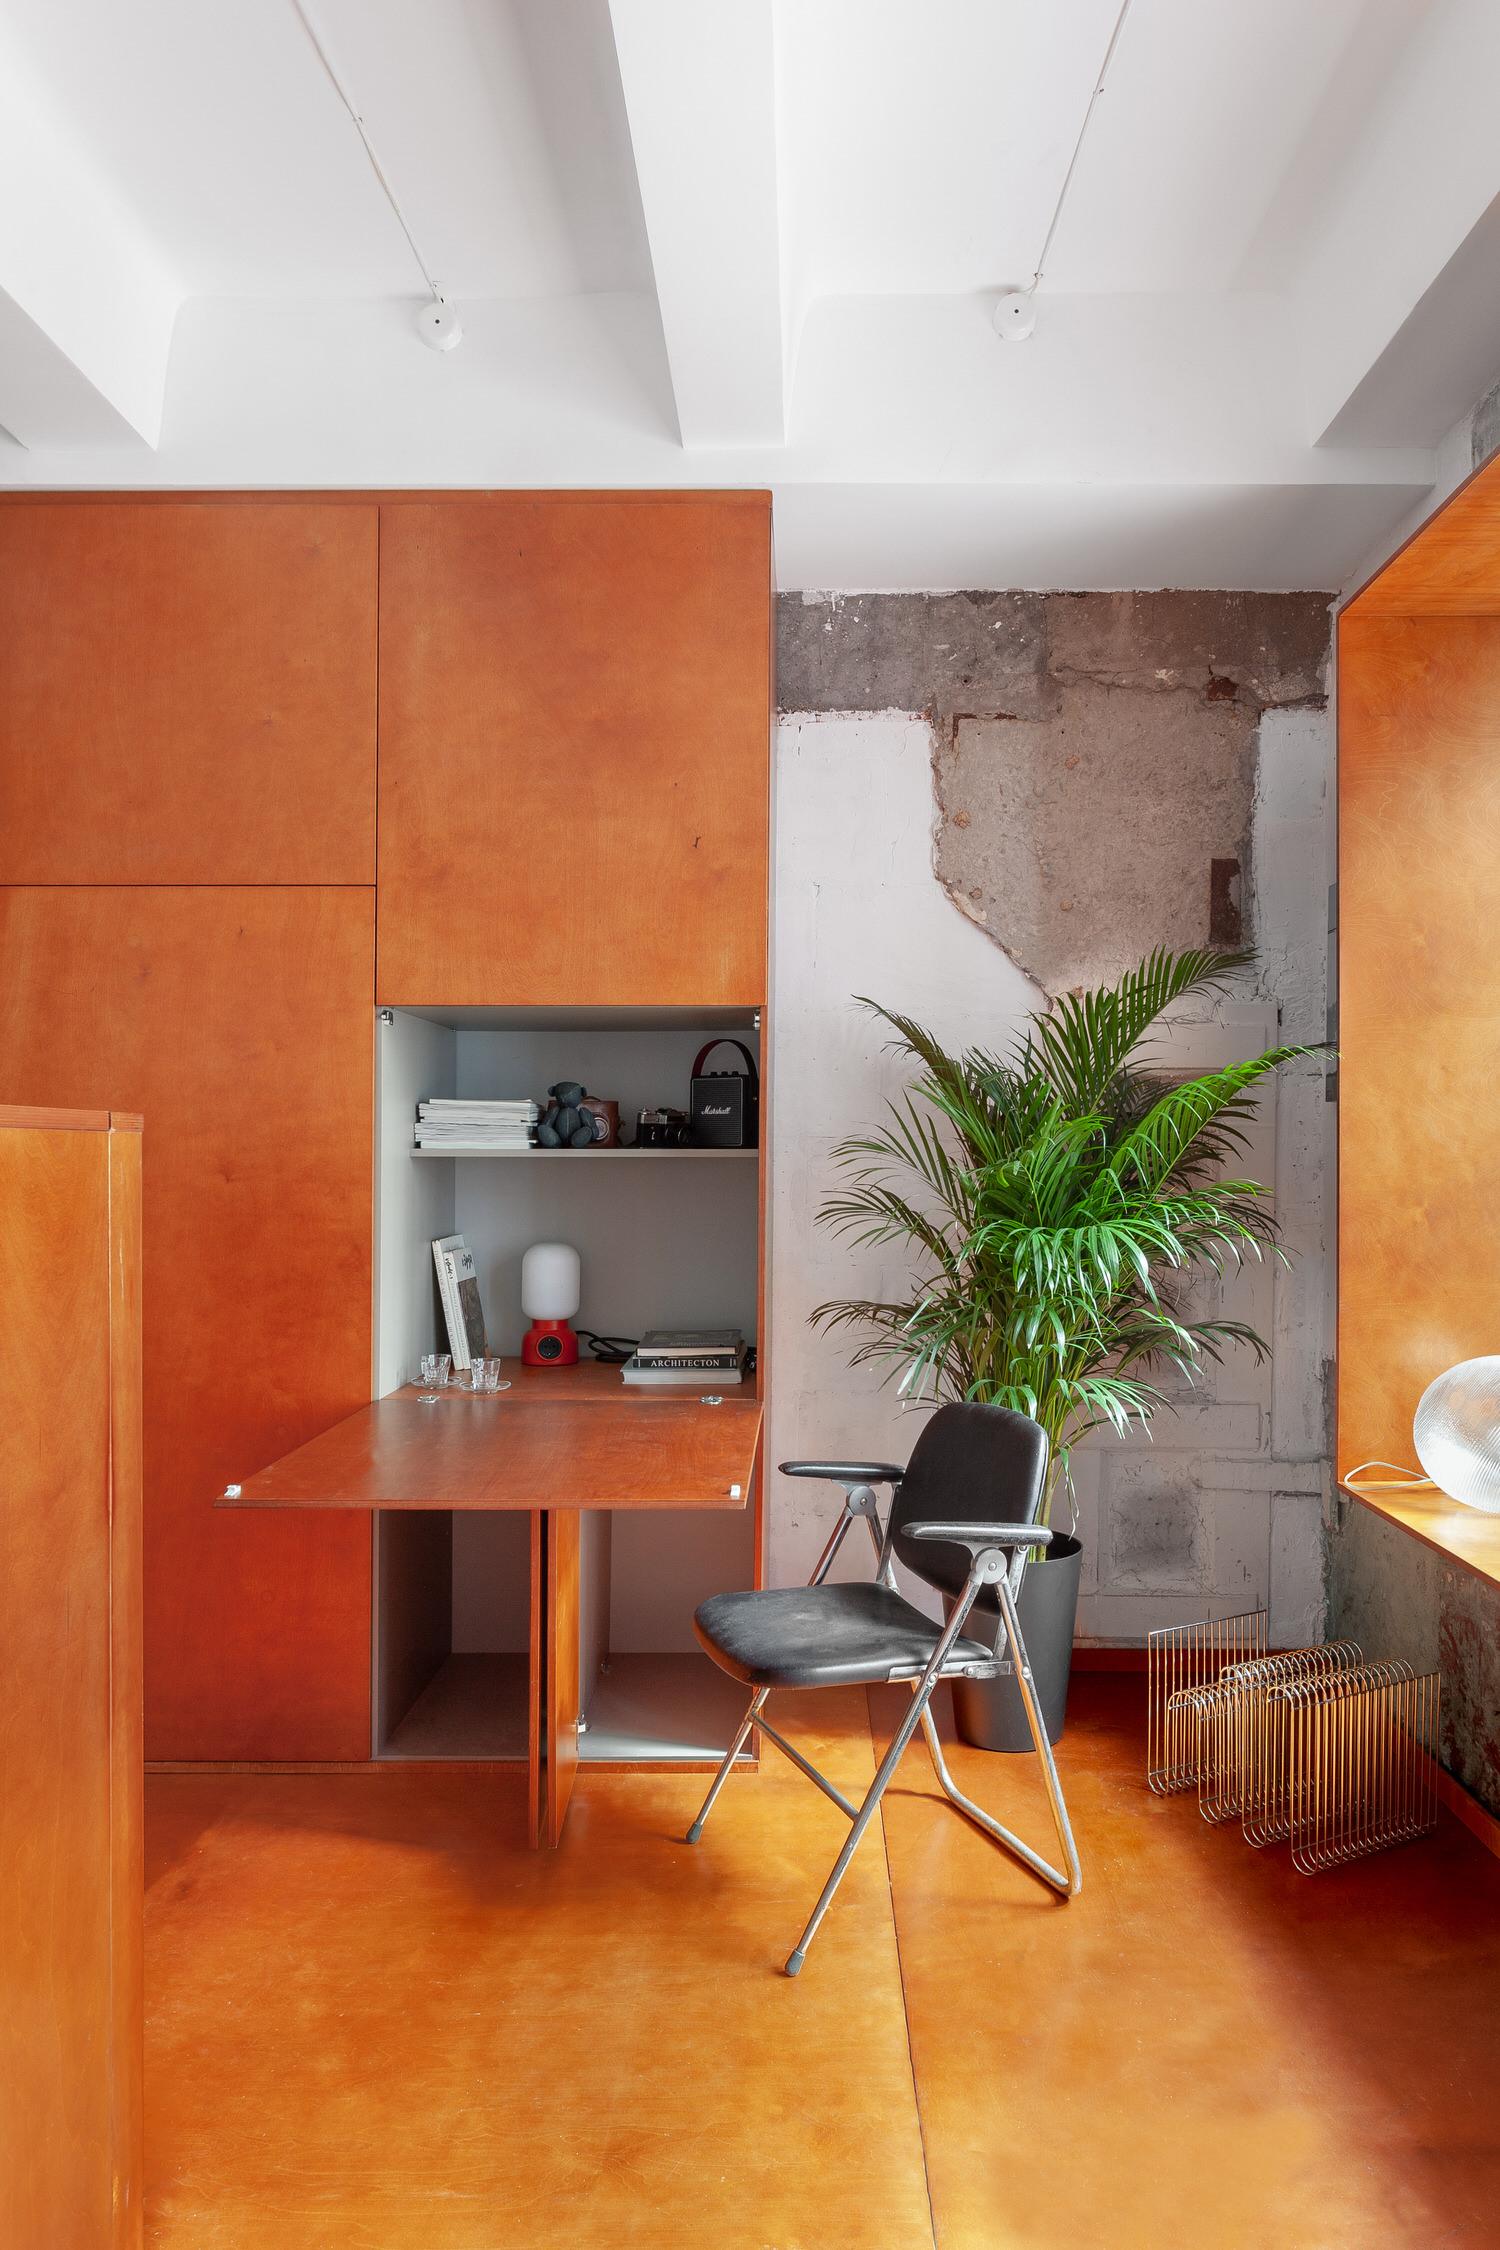 Room Design Buro Commune 303 Tiny Moscow Apartment Interior Photo Polina Poludkina Yellowtrace 23